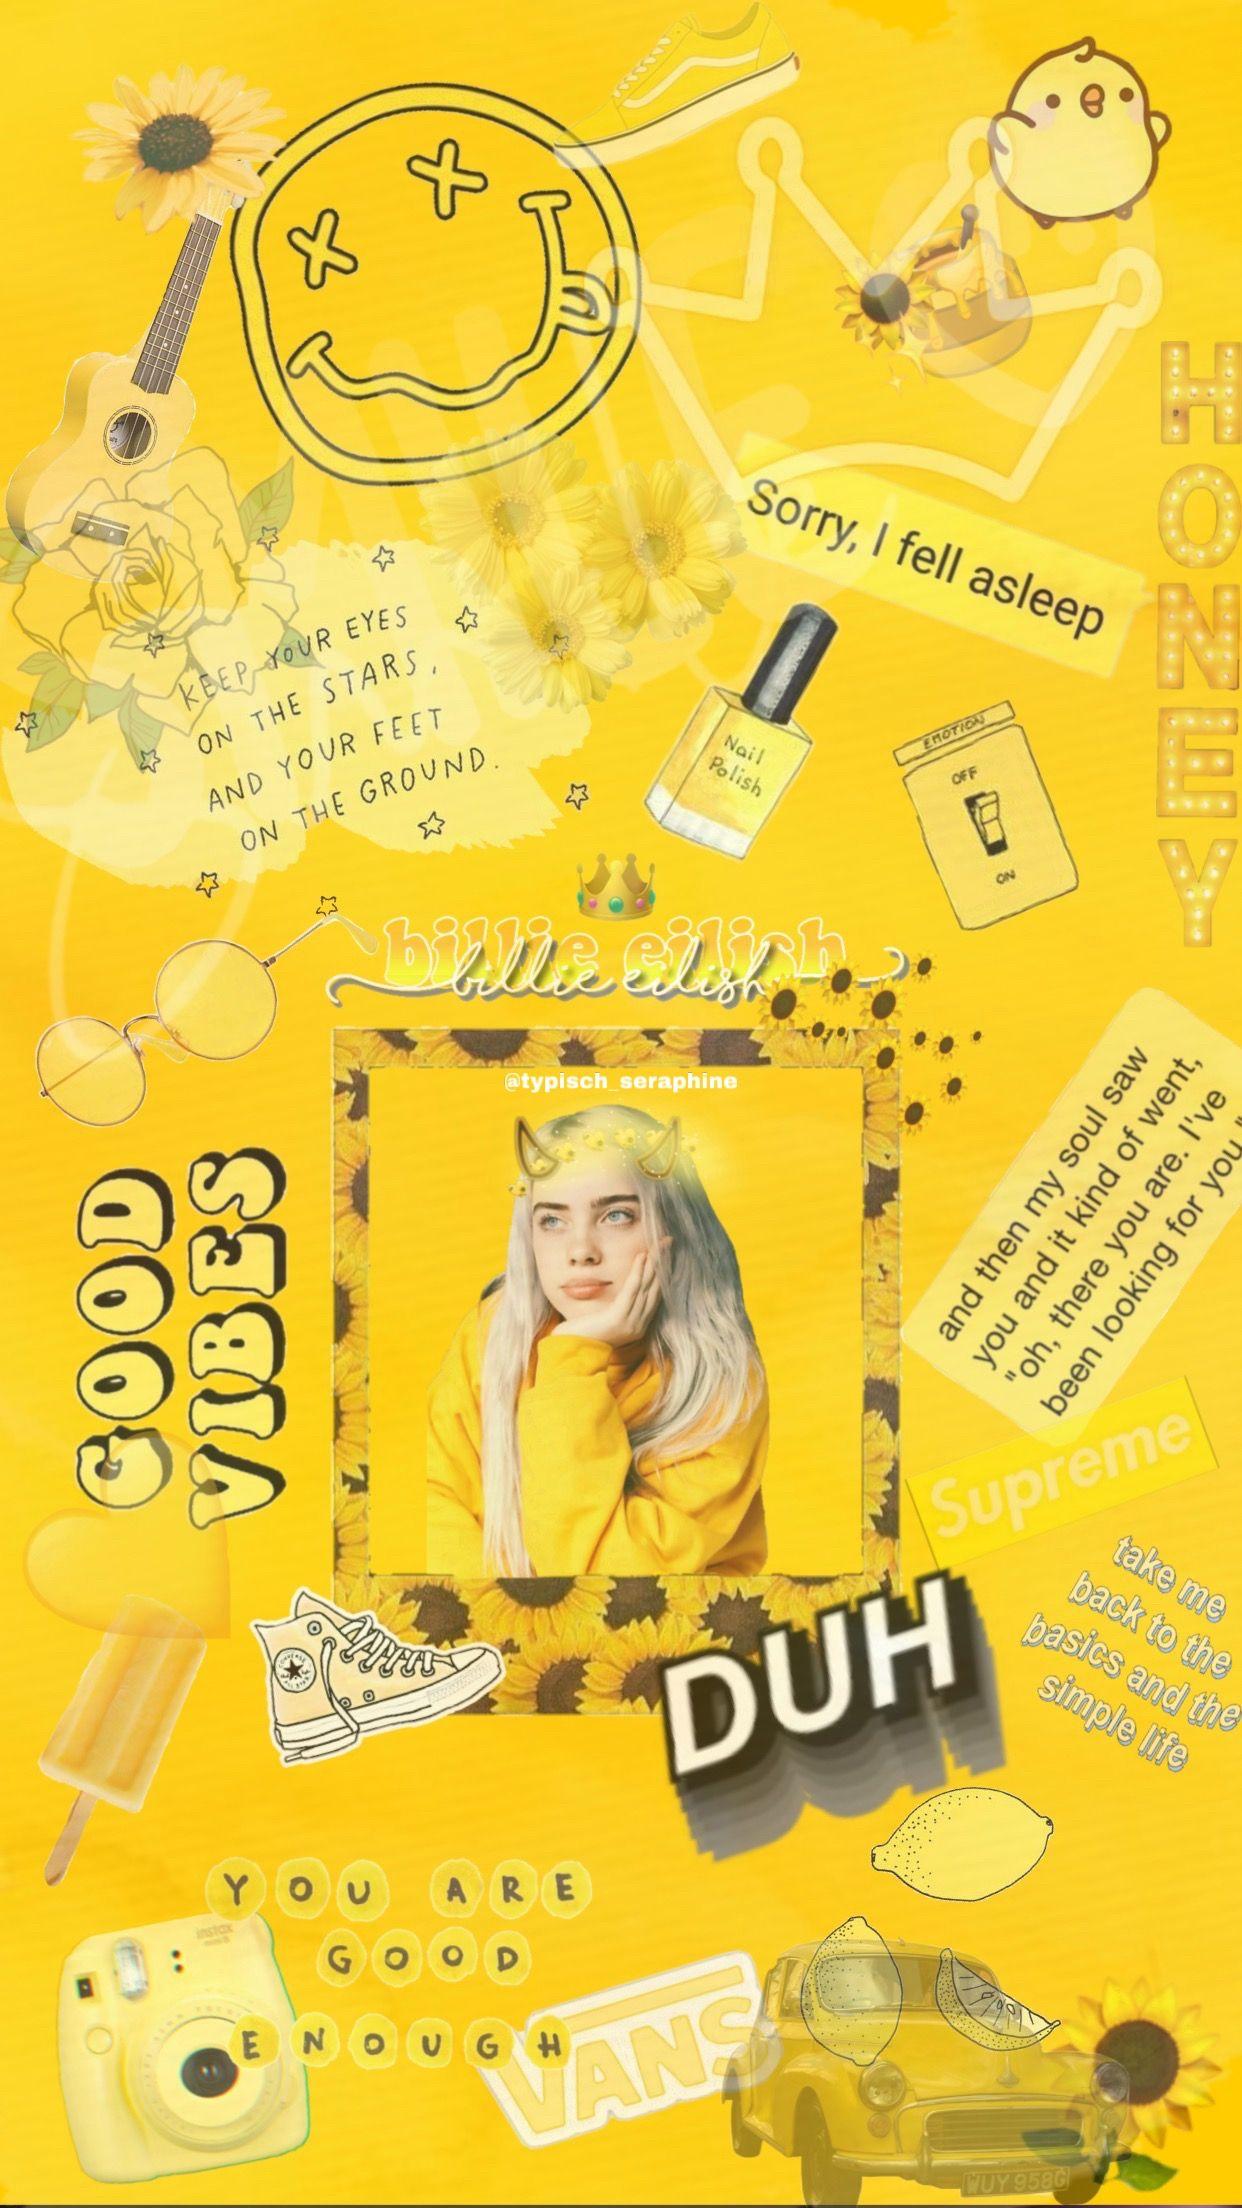 Iphone Xr Wallpaper Yellow Aesthetic Billie Eilish